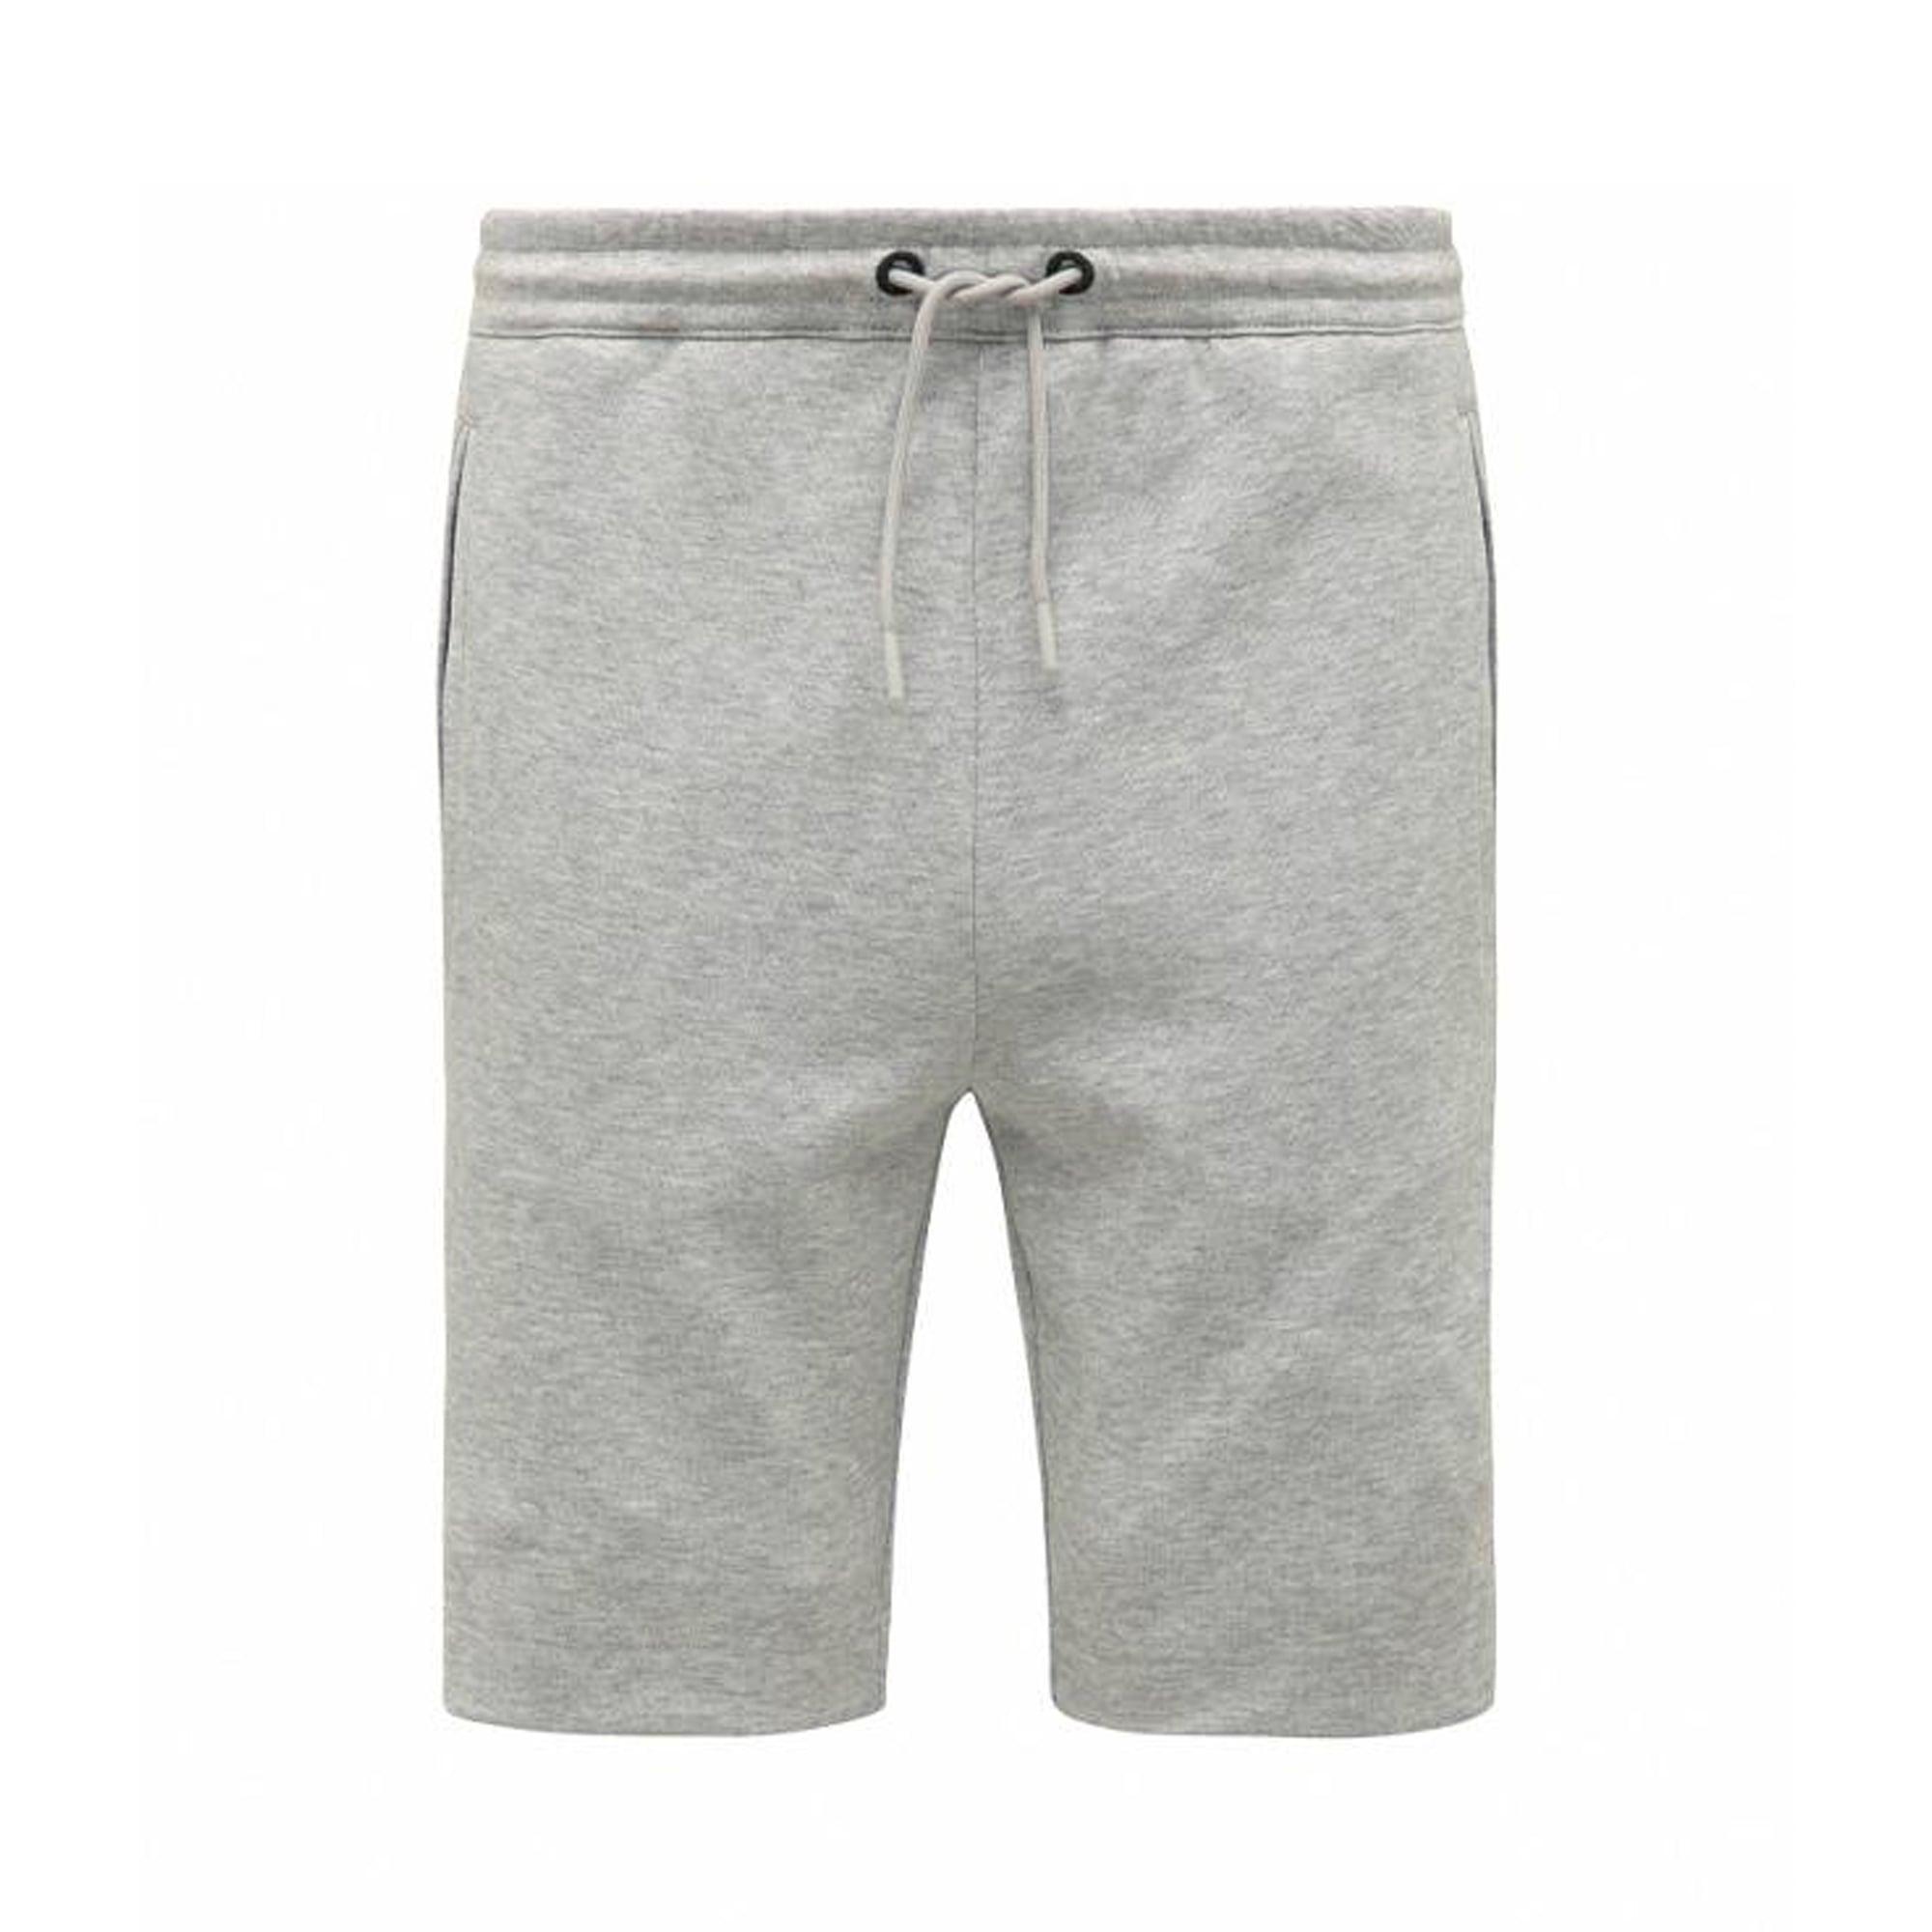 6cf67ee9b Boss Green Stockist   Headlo Pastel Grey Shorts